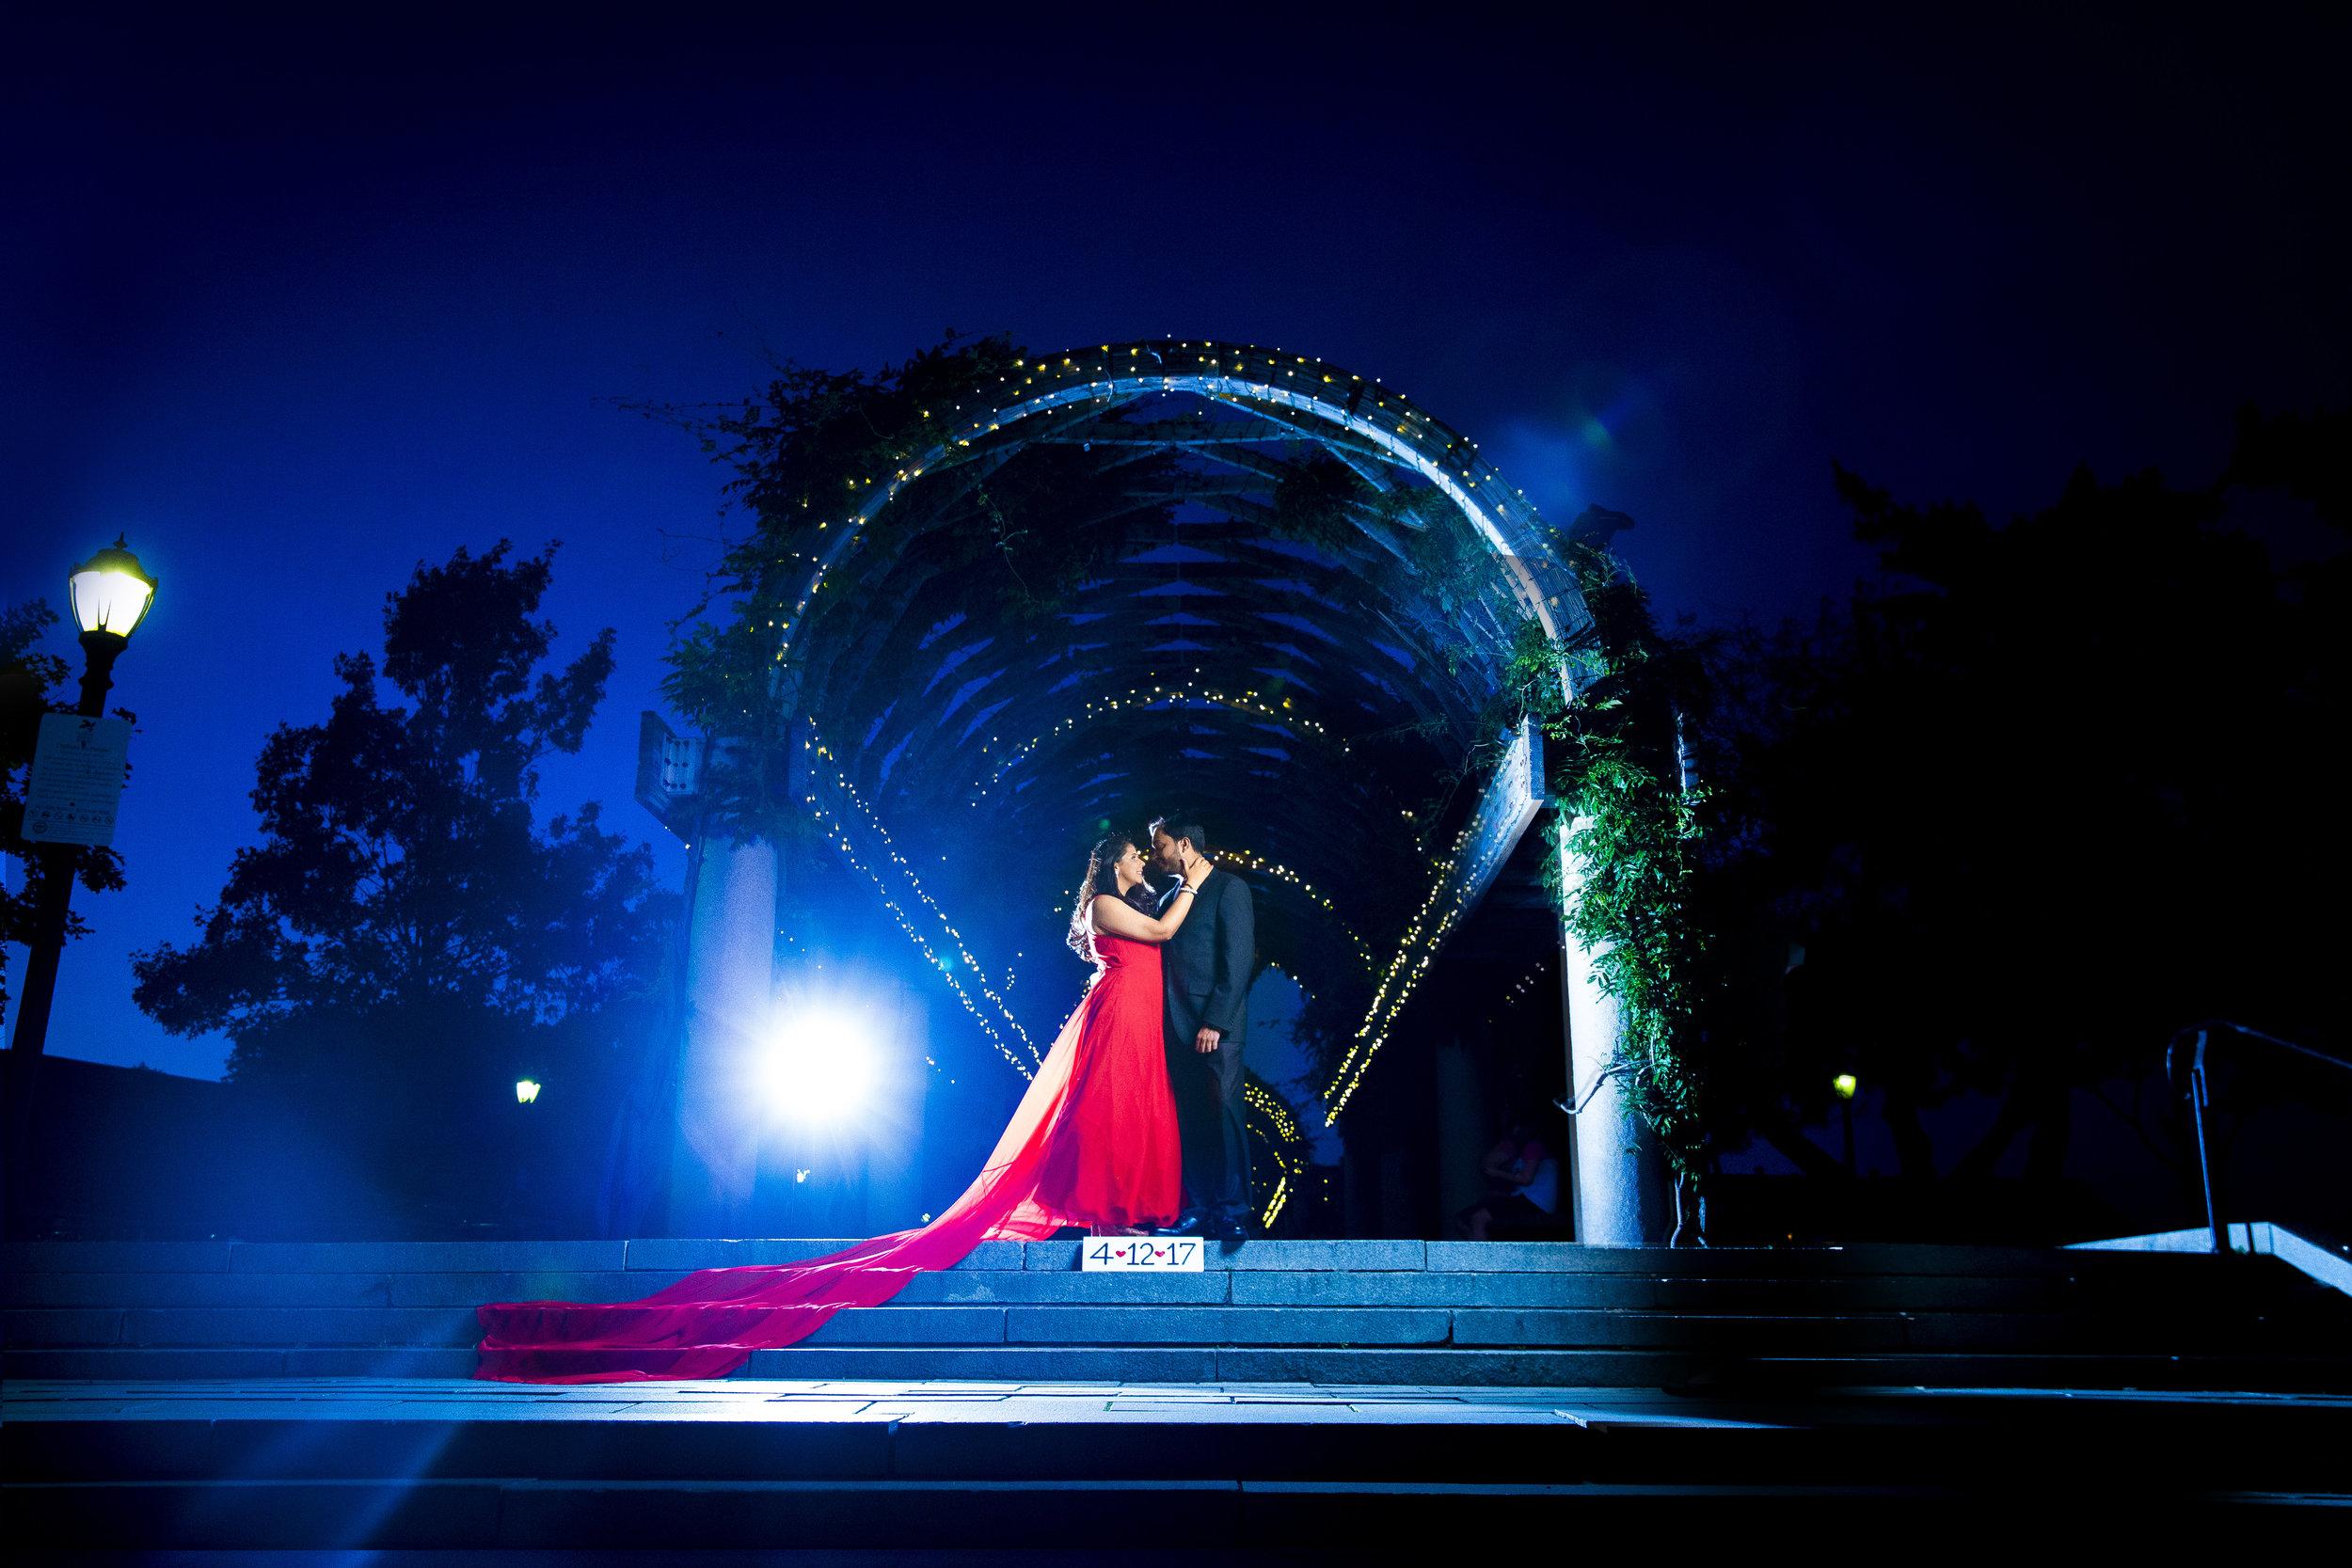 314A1180Giovanni The Photographer-Boston Wedding and Photography Bhumika and ShrenikPS.jpg